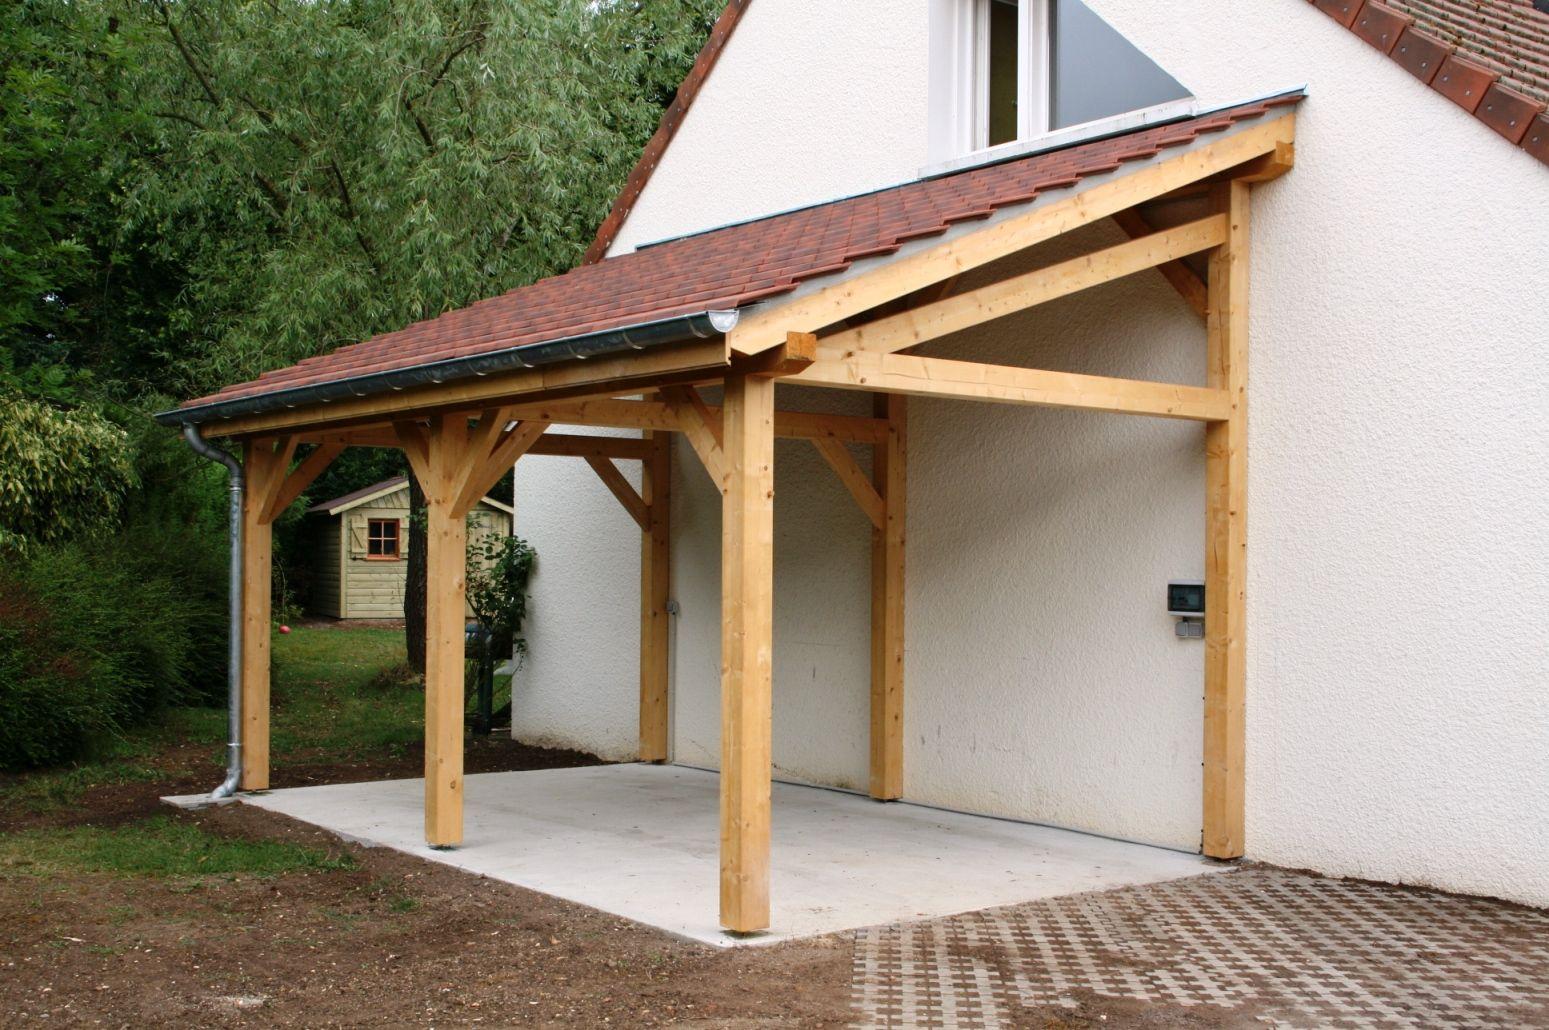 Garage Bois Anjou 1 Pente 2.70 M X 7 M - Gamme Cerisier ... serapportantà Appenti De Jardin